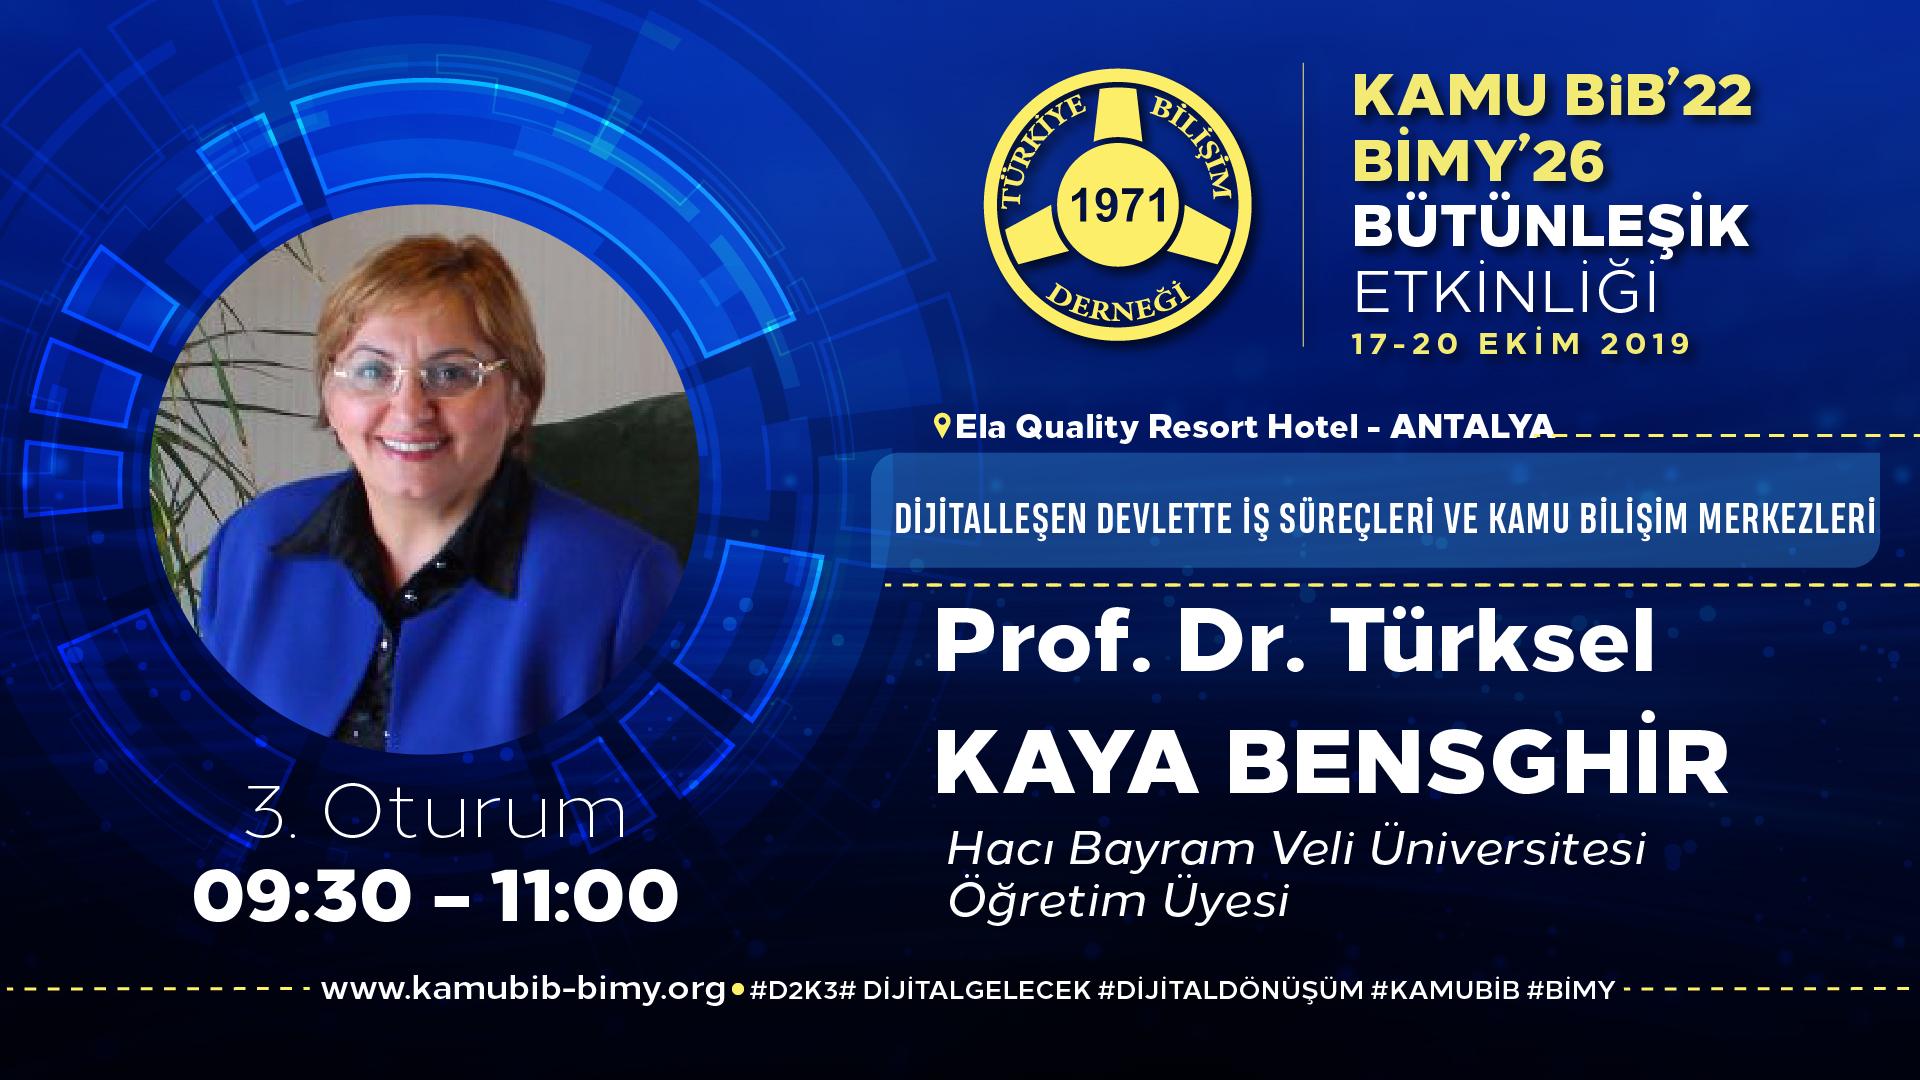 Türksel KAYA BENSGHİR - KamuBİB'22 BİMY'26